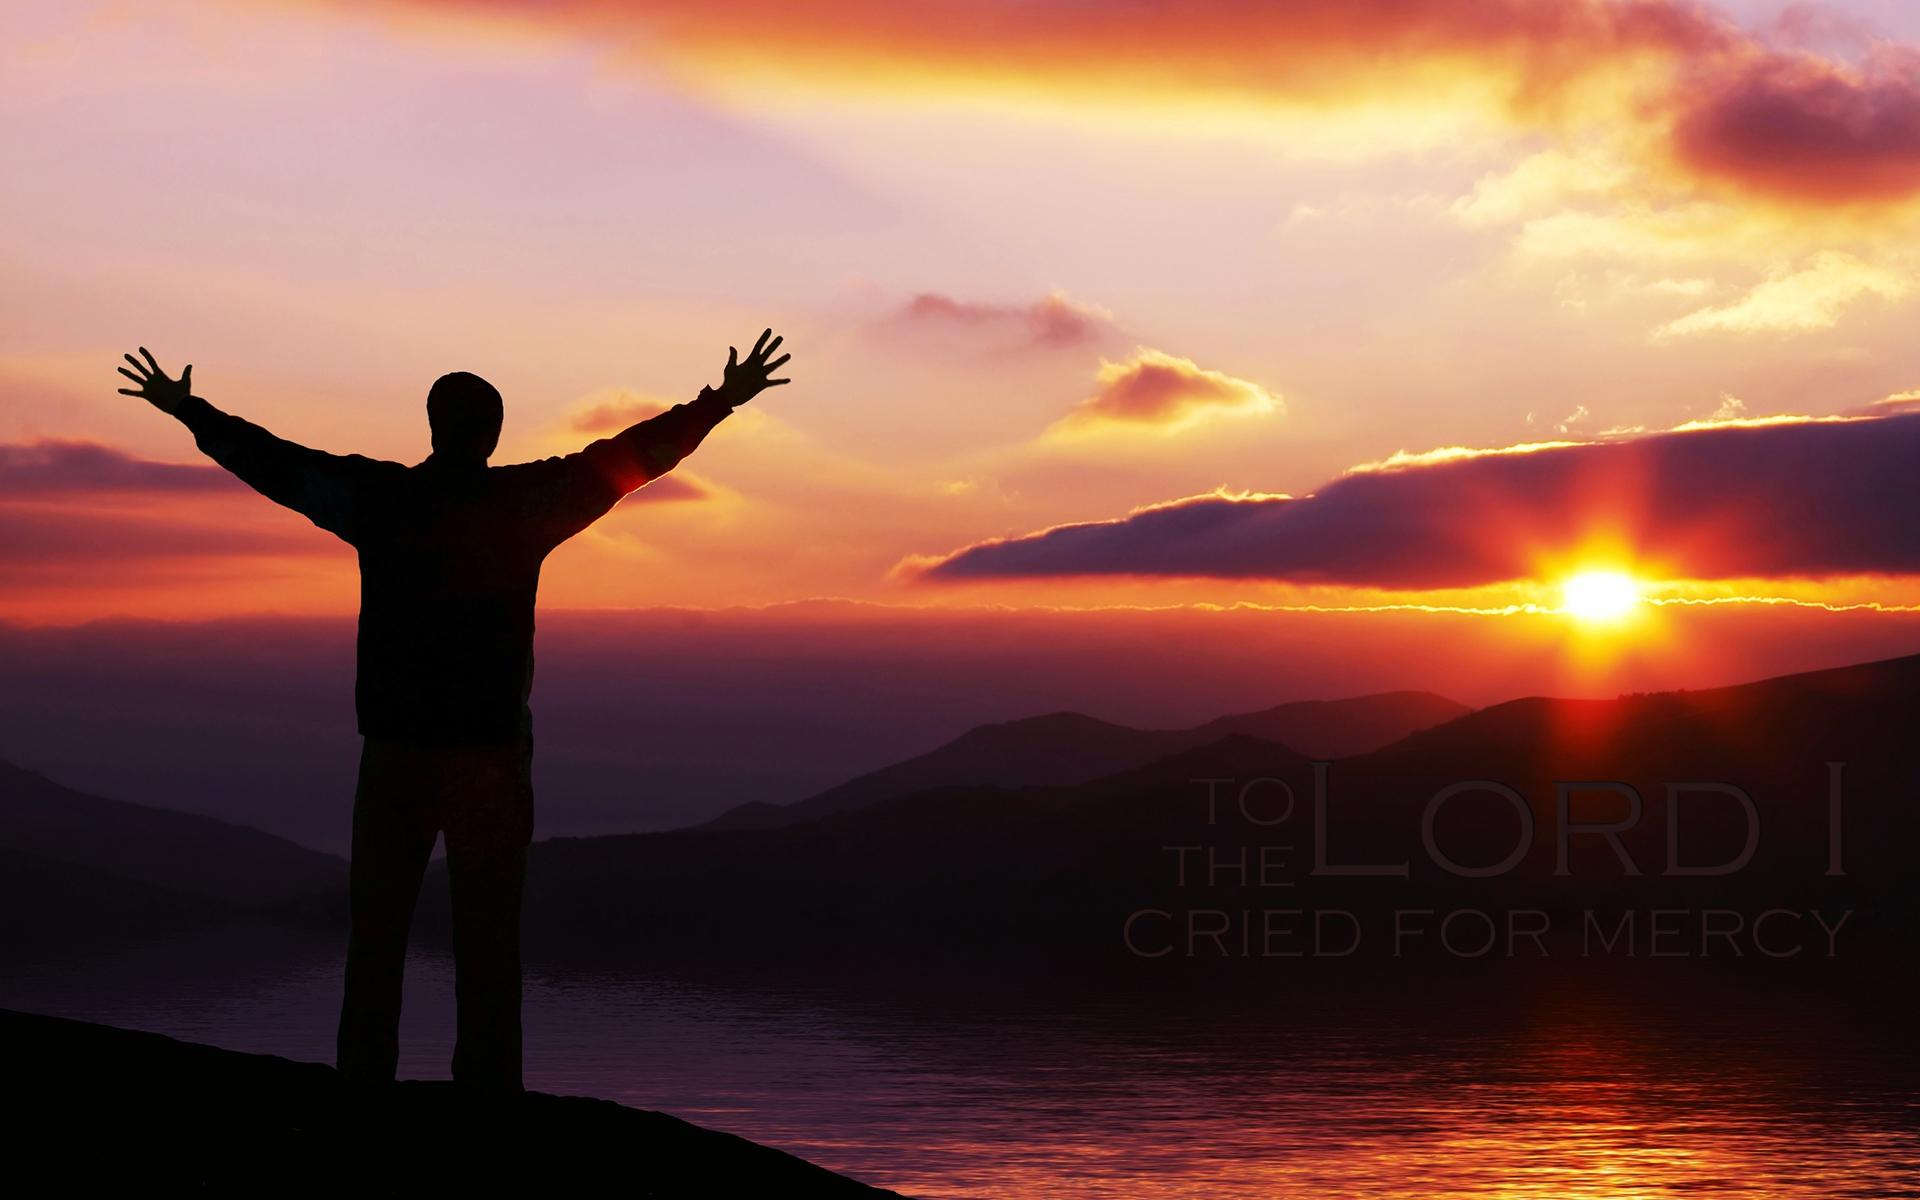 Praise And Worship wallpaper   877244 1920x1200